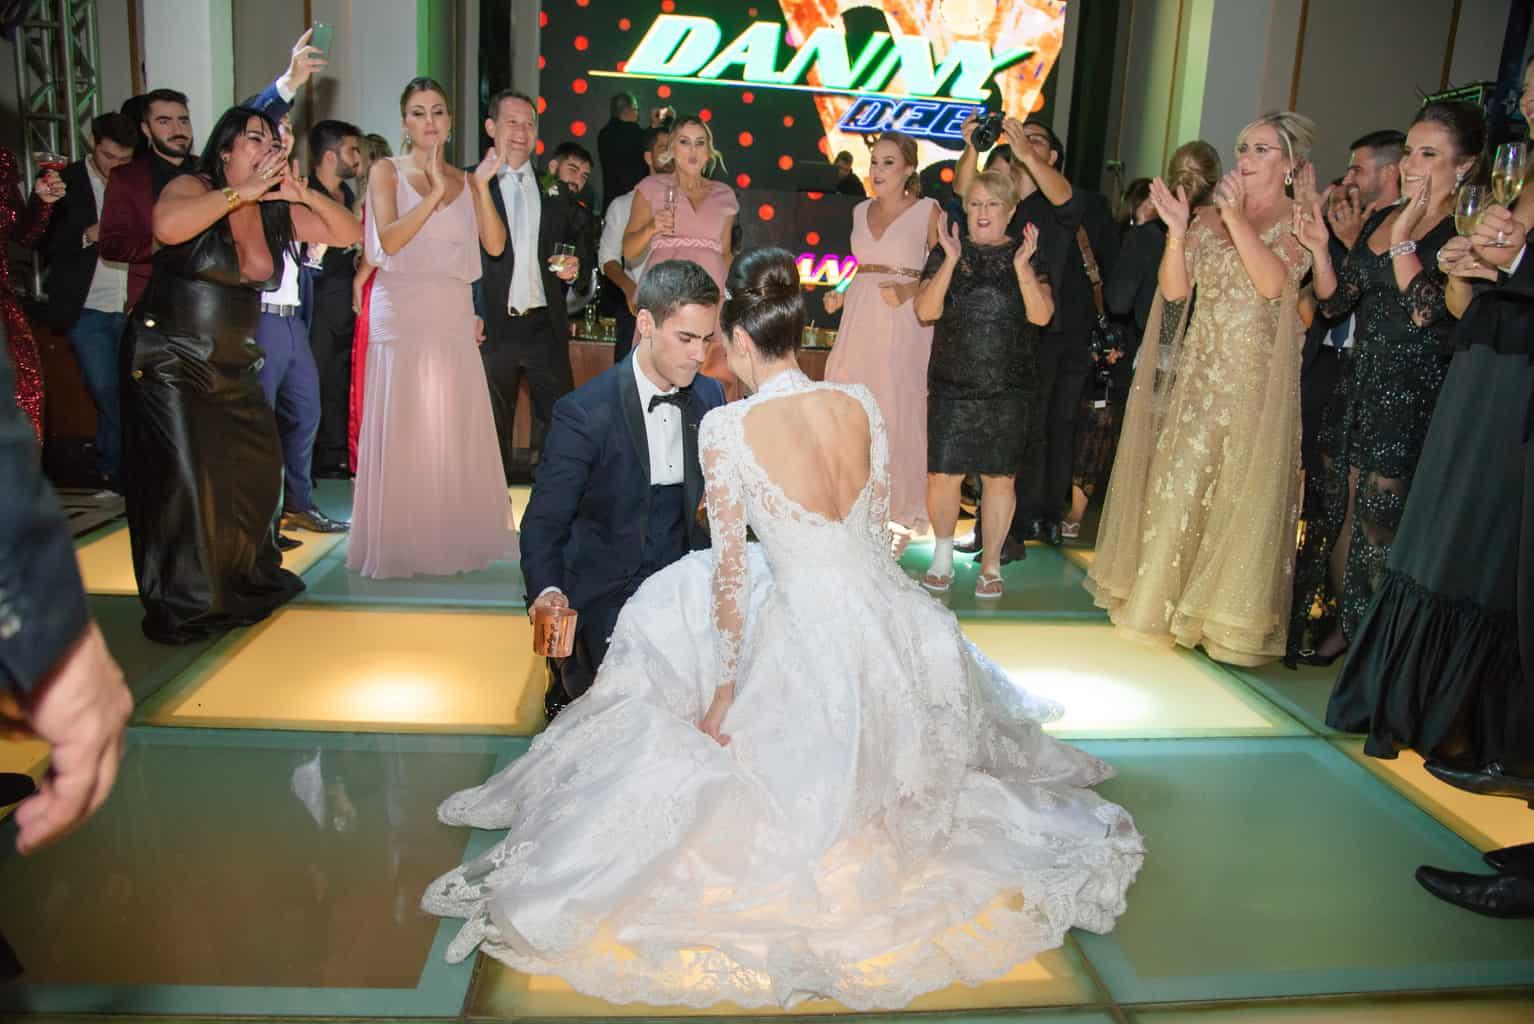 casamento-Patricia-e-Thiago-Copacabana-Palace-Daniel-Curz-A-Roseira-Paula-Rocha-Marina-Fava-festa1871-Patricia-e-Thiago-DSC_6854